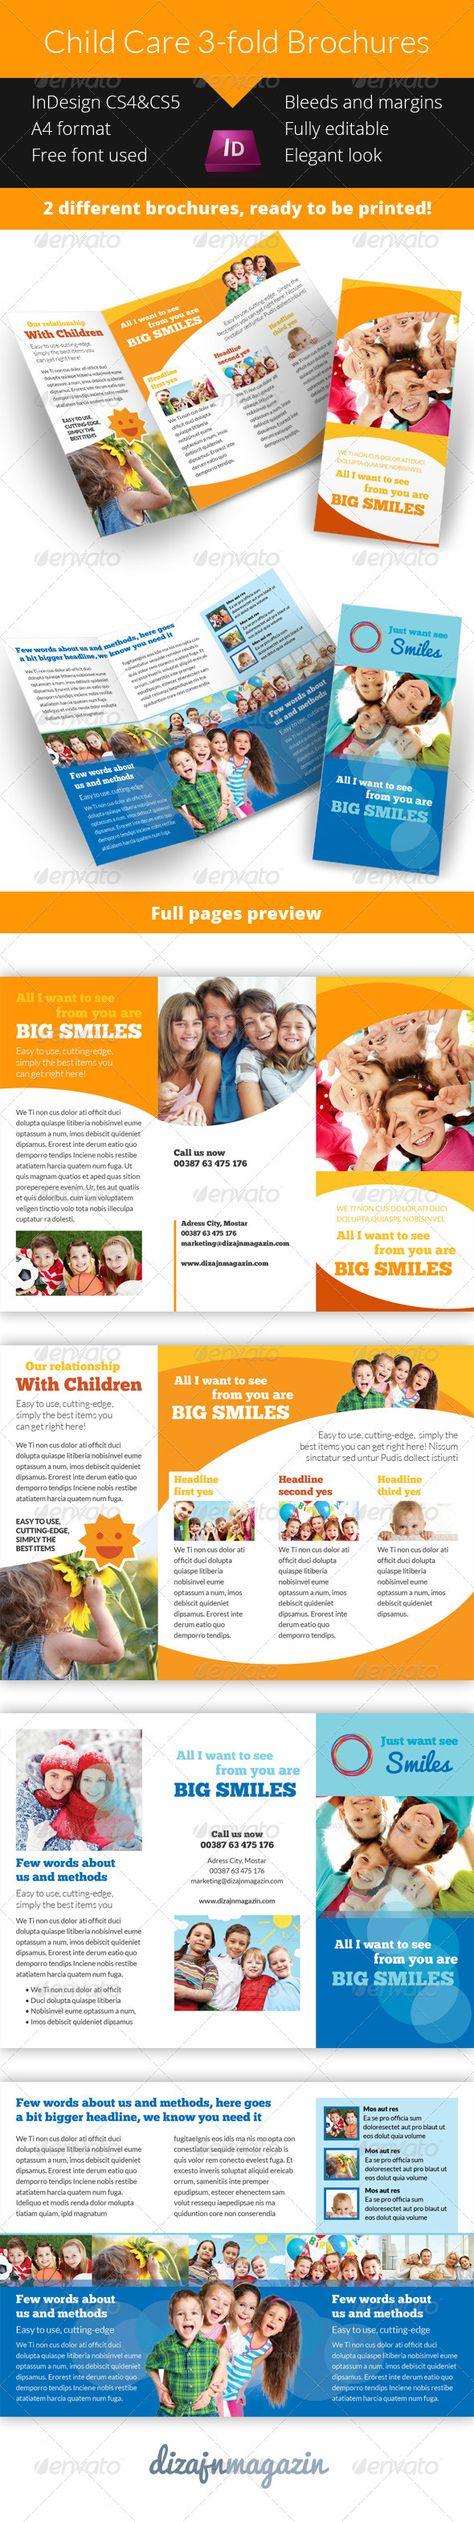 Child Care Kindergarten 3 Fold Brochure Pinterest Brochures